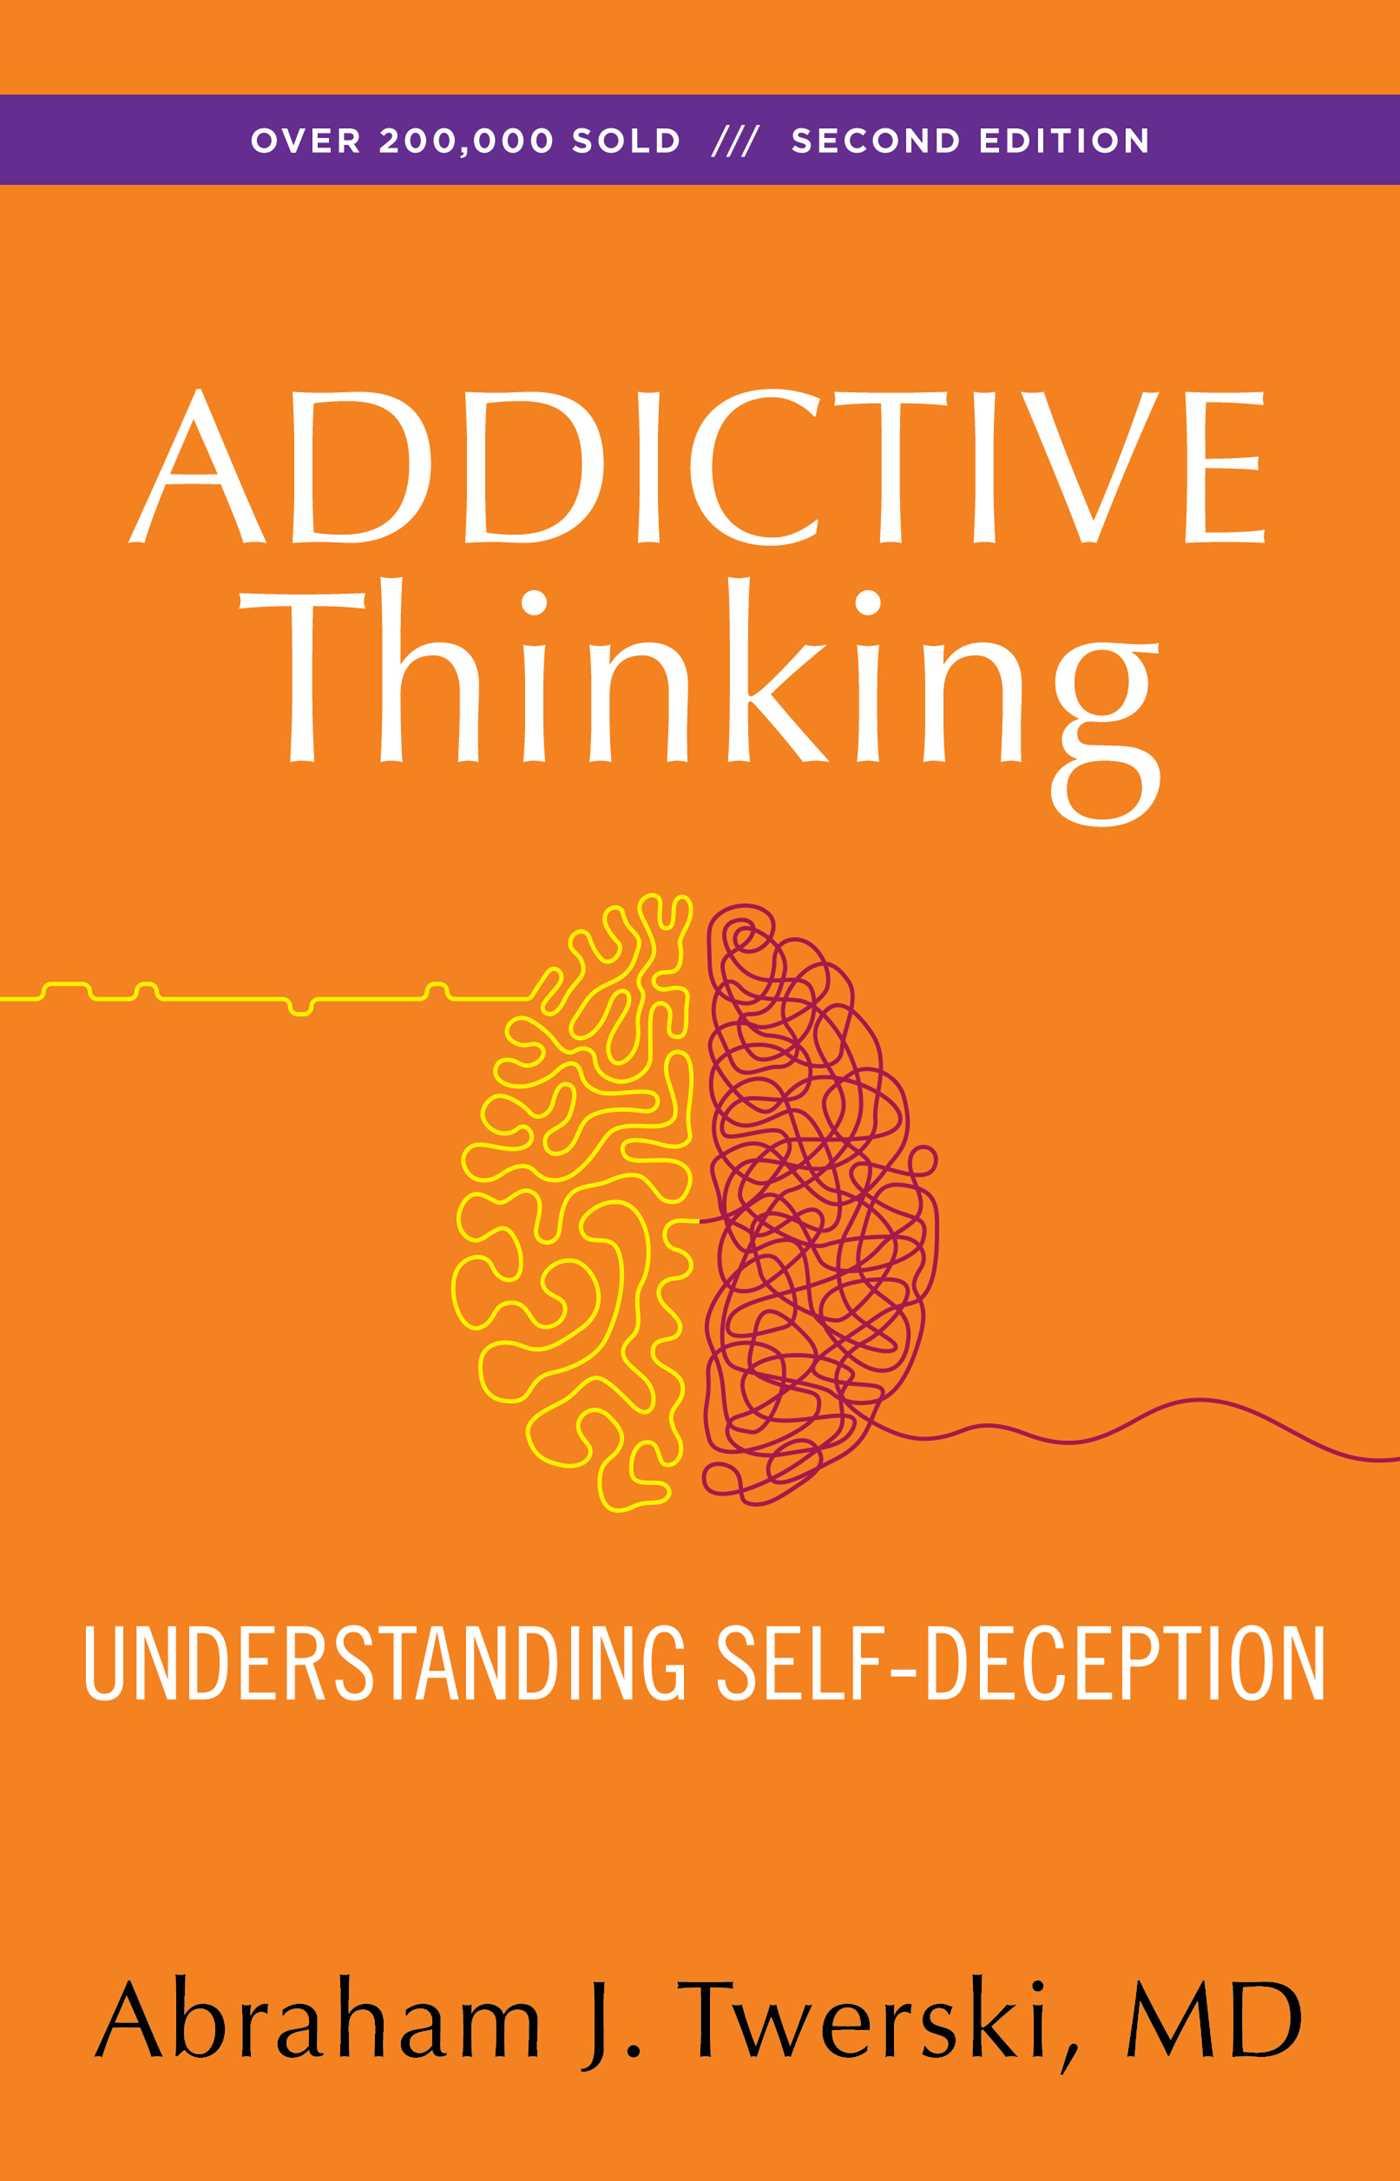 Addictive thinking 9781568381381 hr